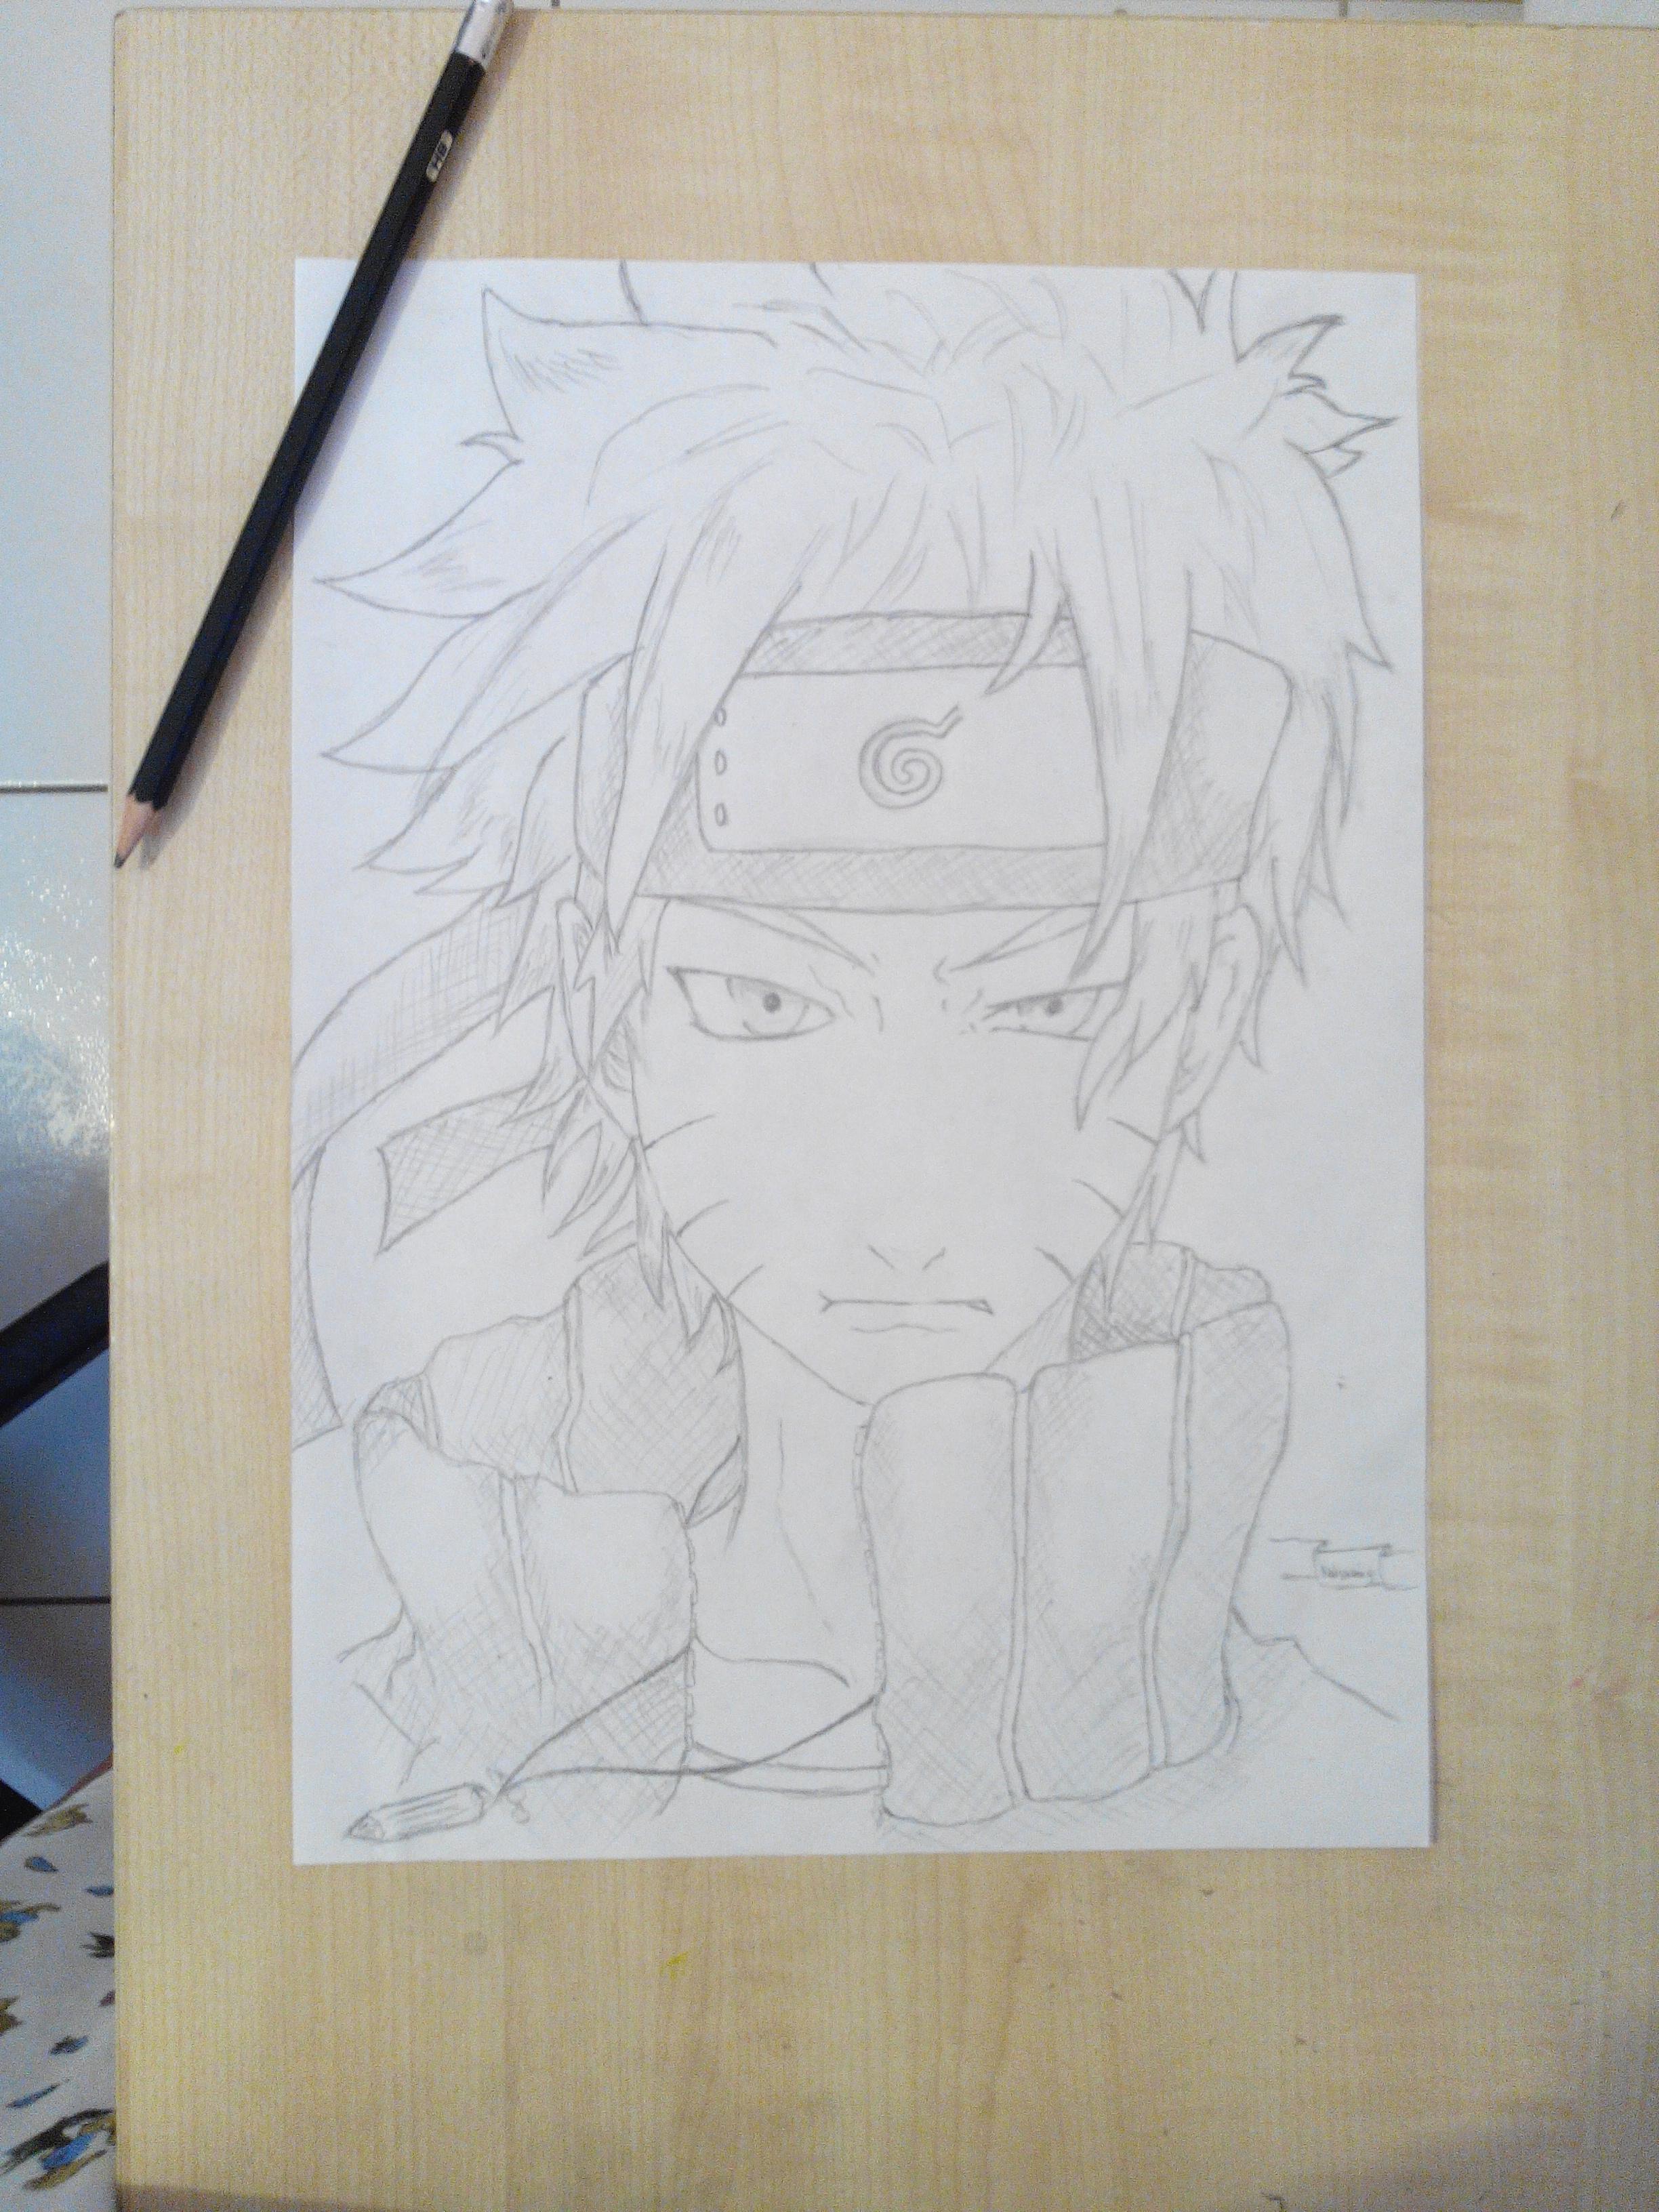 Dessin Naruto Shippuden Pencildrawing Fr